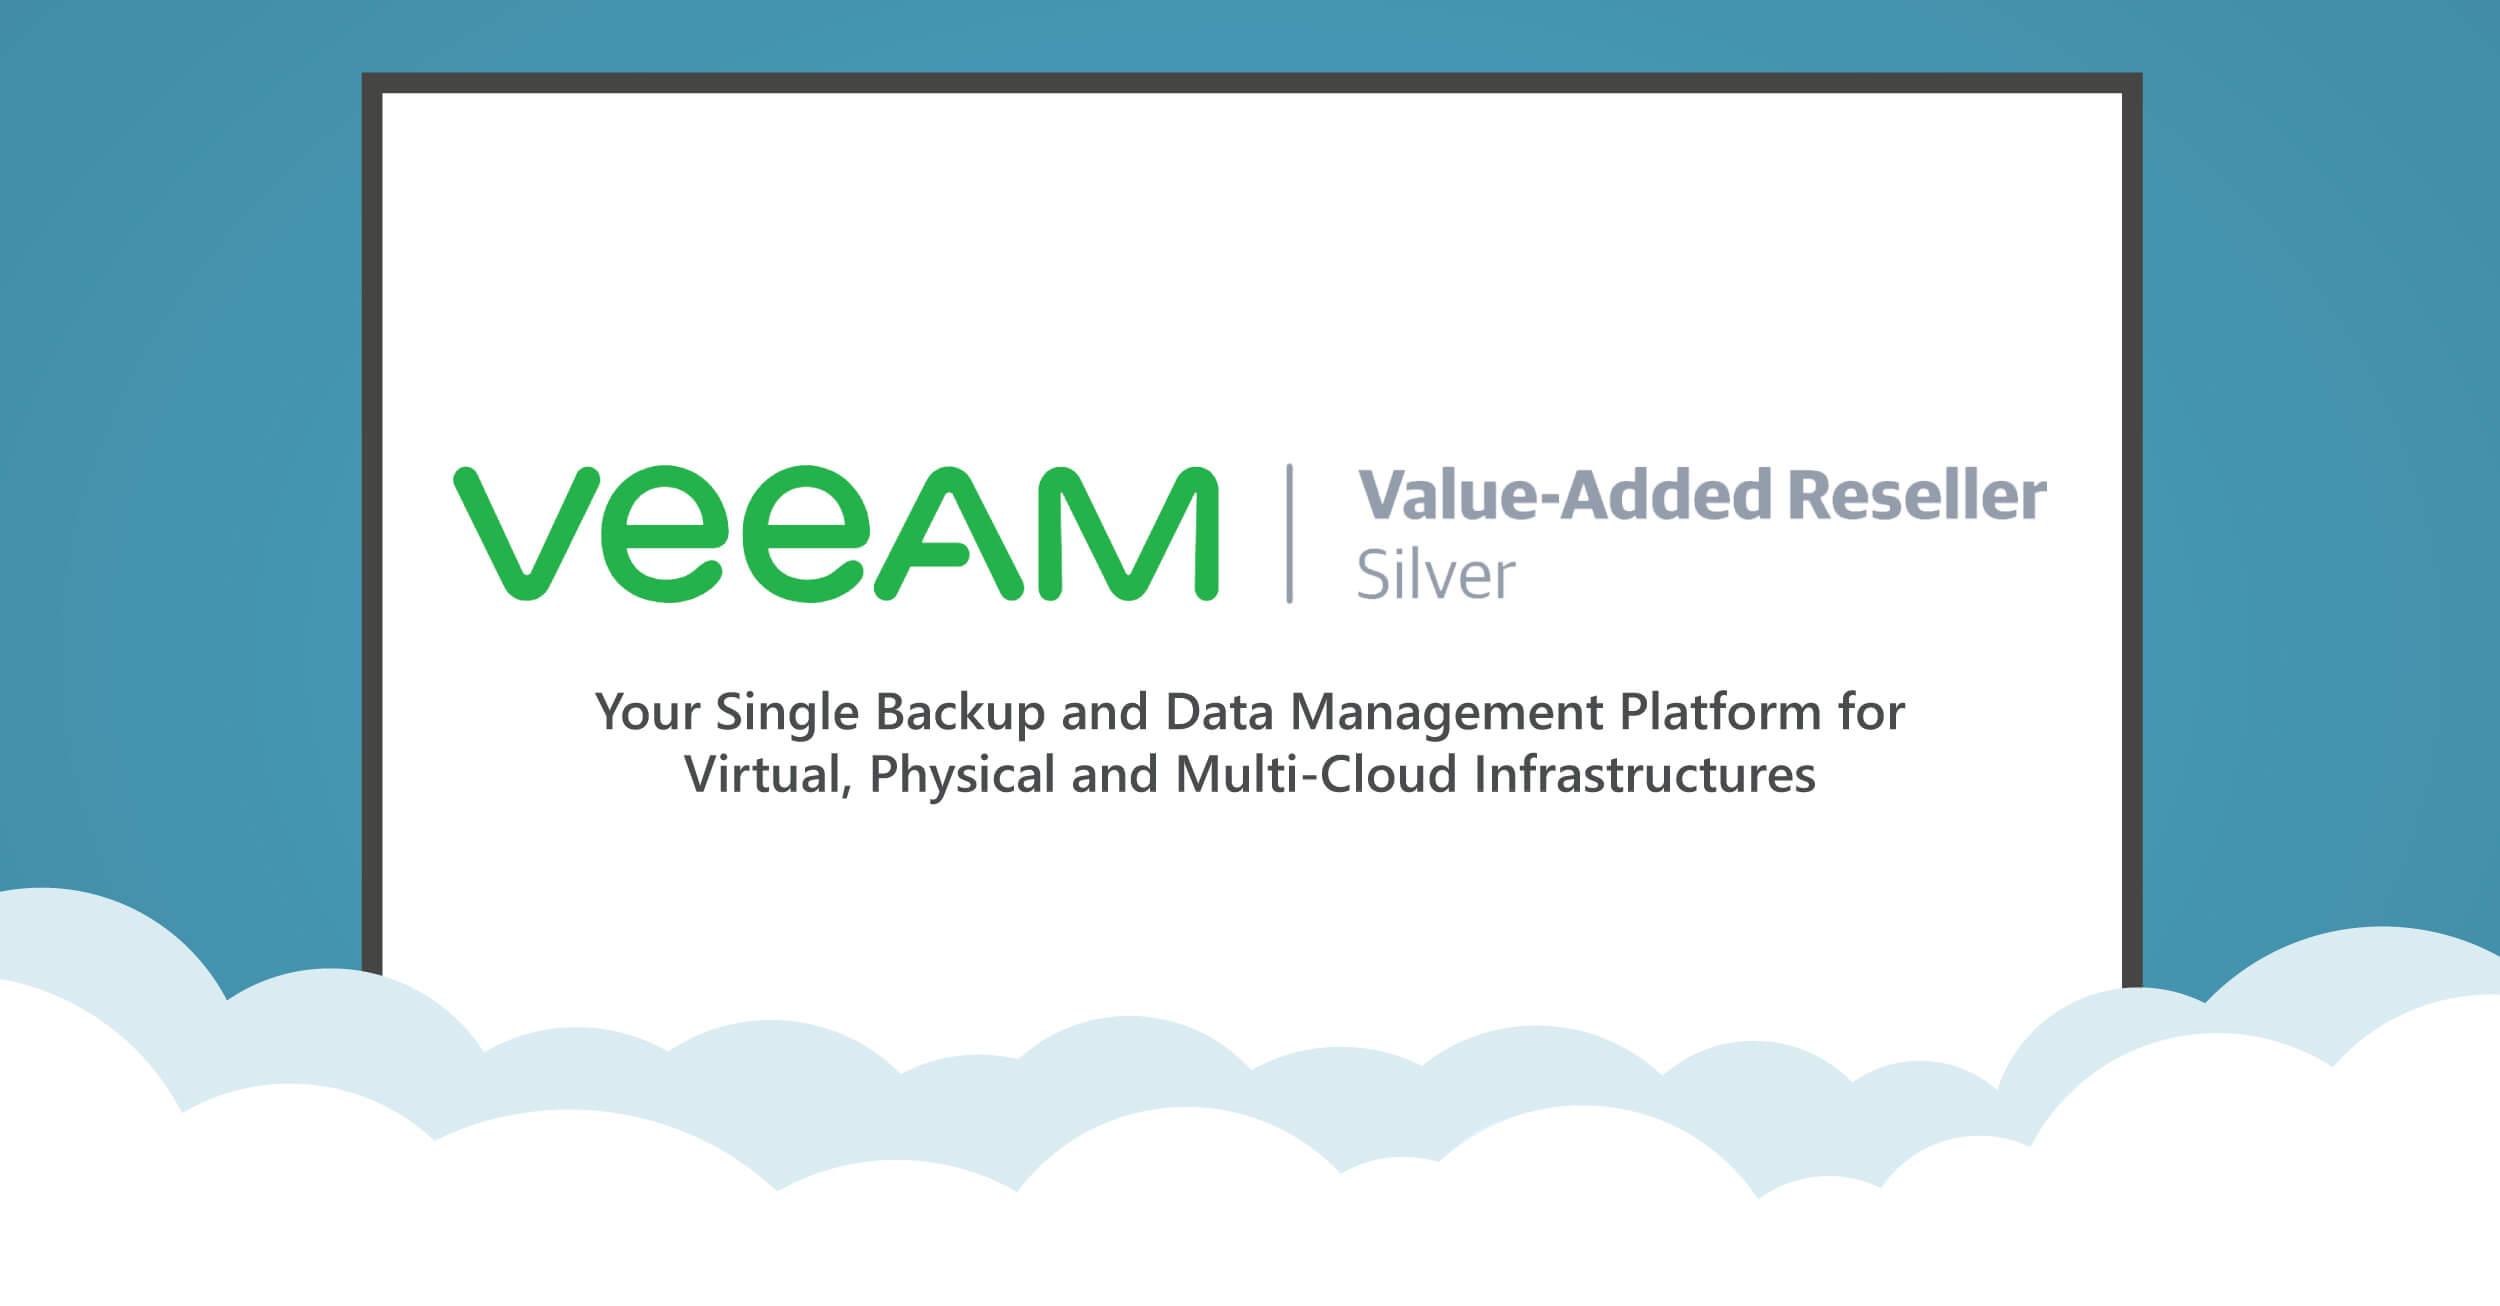 Veeam Value-Added Reseller Silver Header